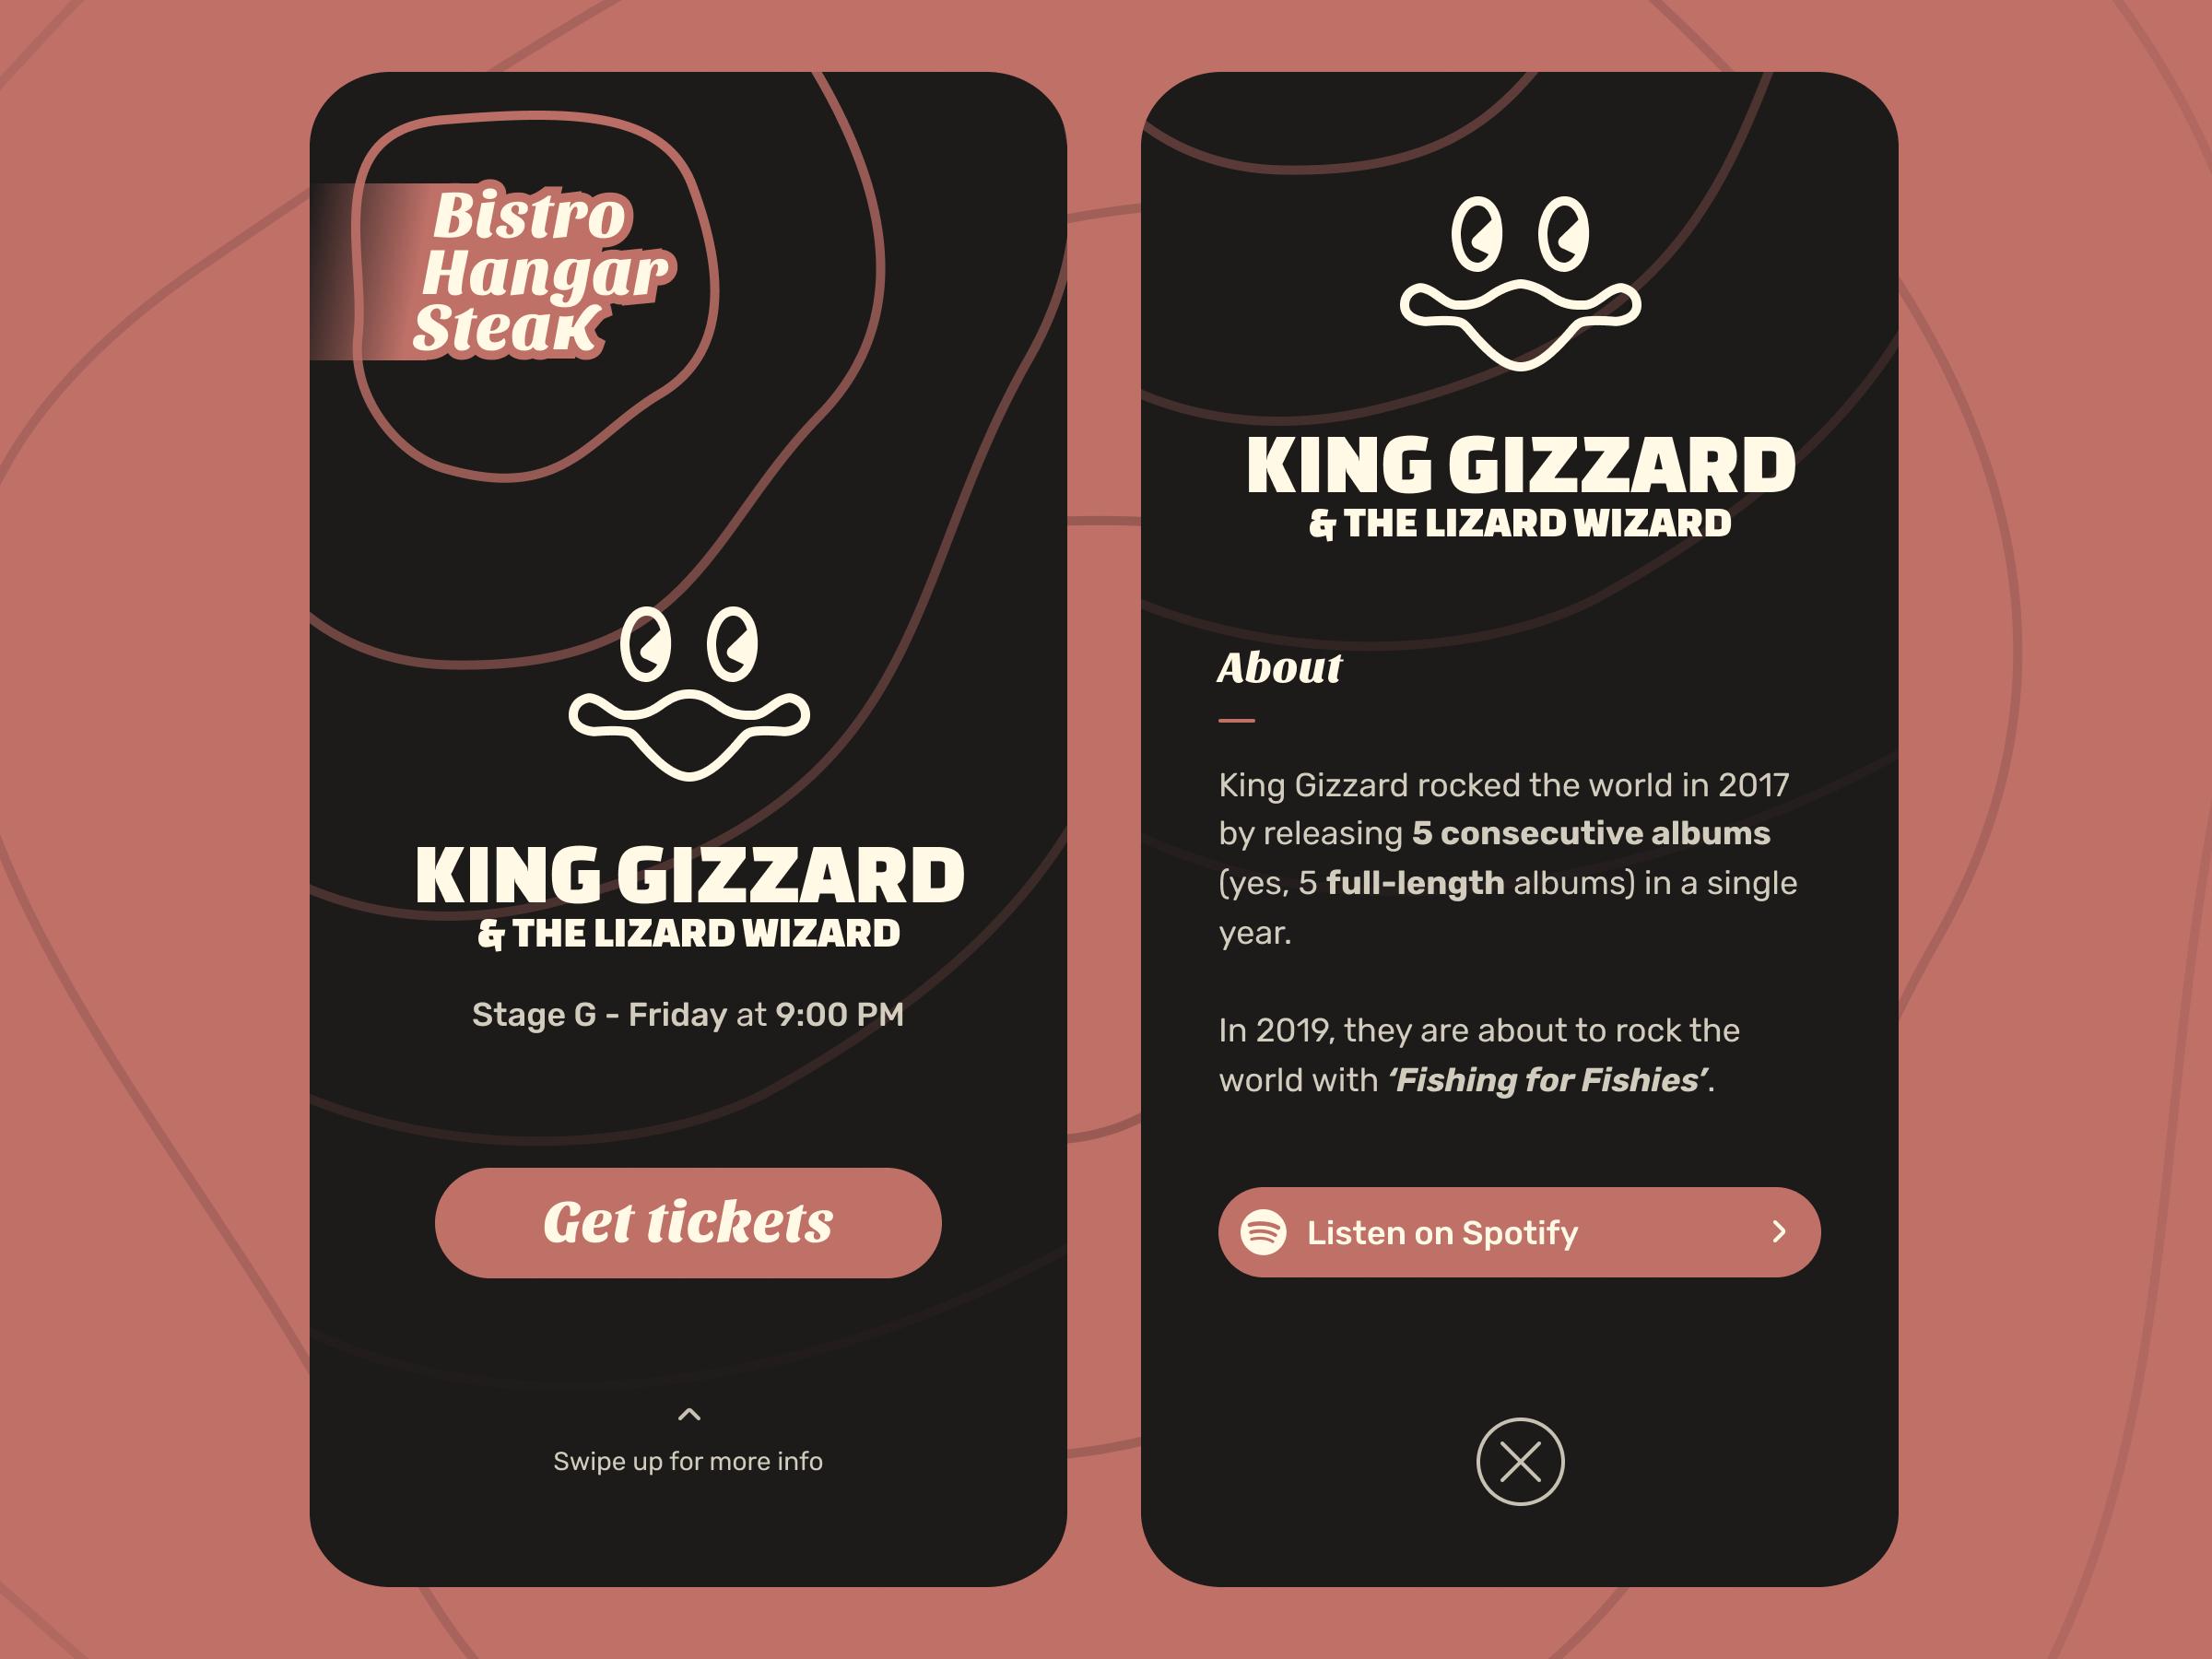 Bistro Hangar Steak Music Festival App